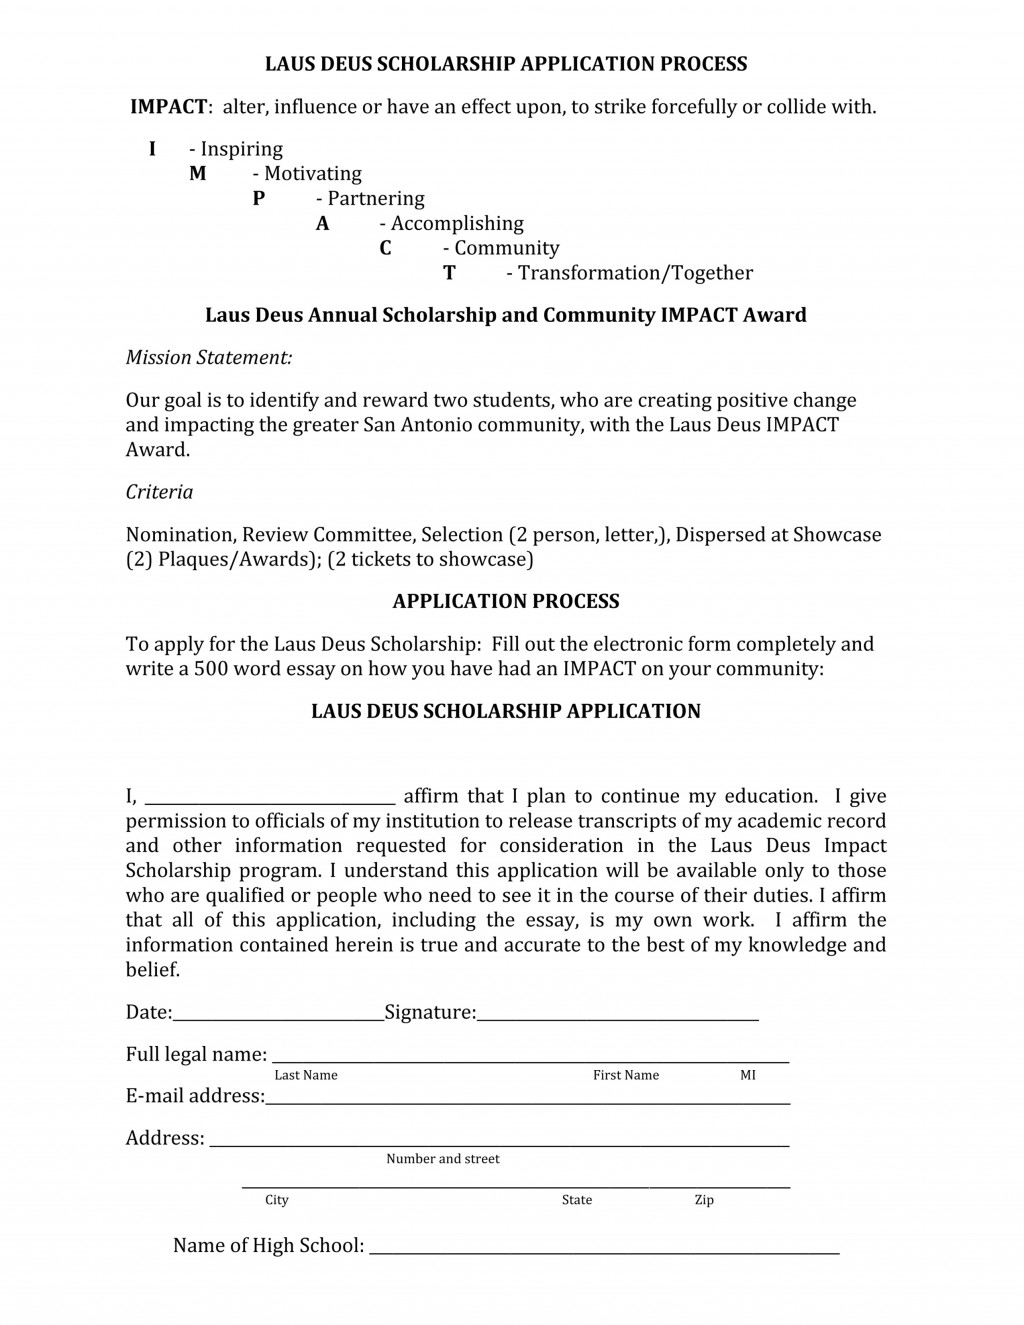 012 Word Essay Laus Deus Scholarship App Rare 200 About Myself Sample Large